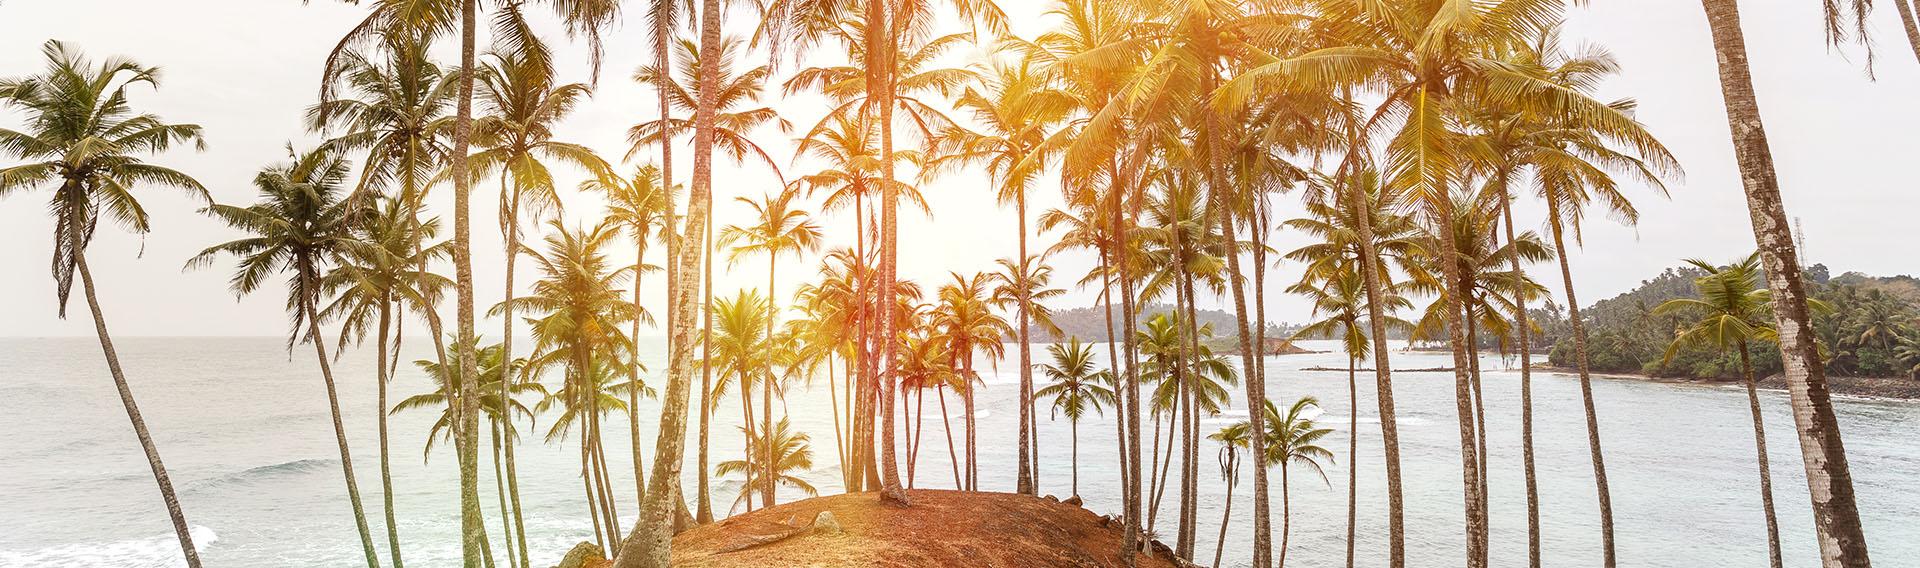 Noël au Sri Lanka avec Mai Globe Travels